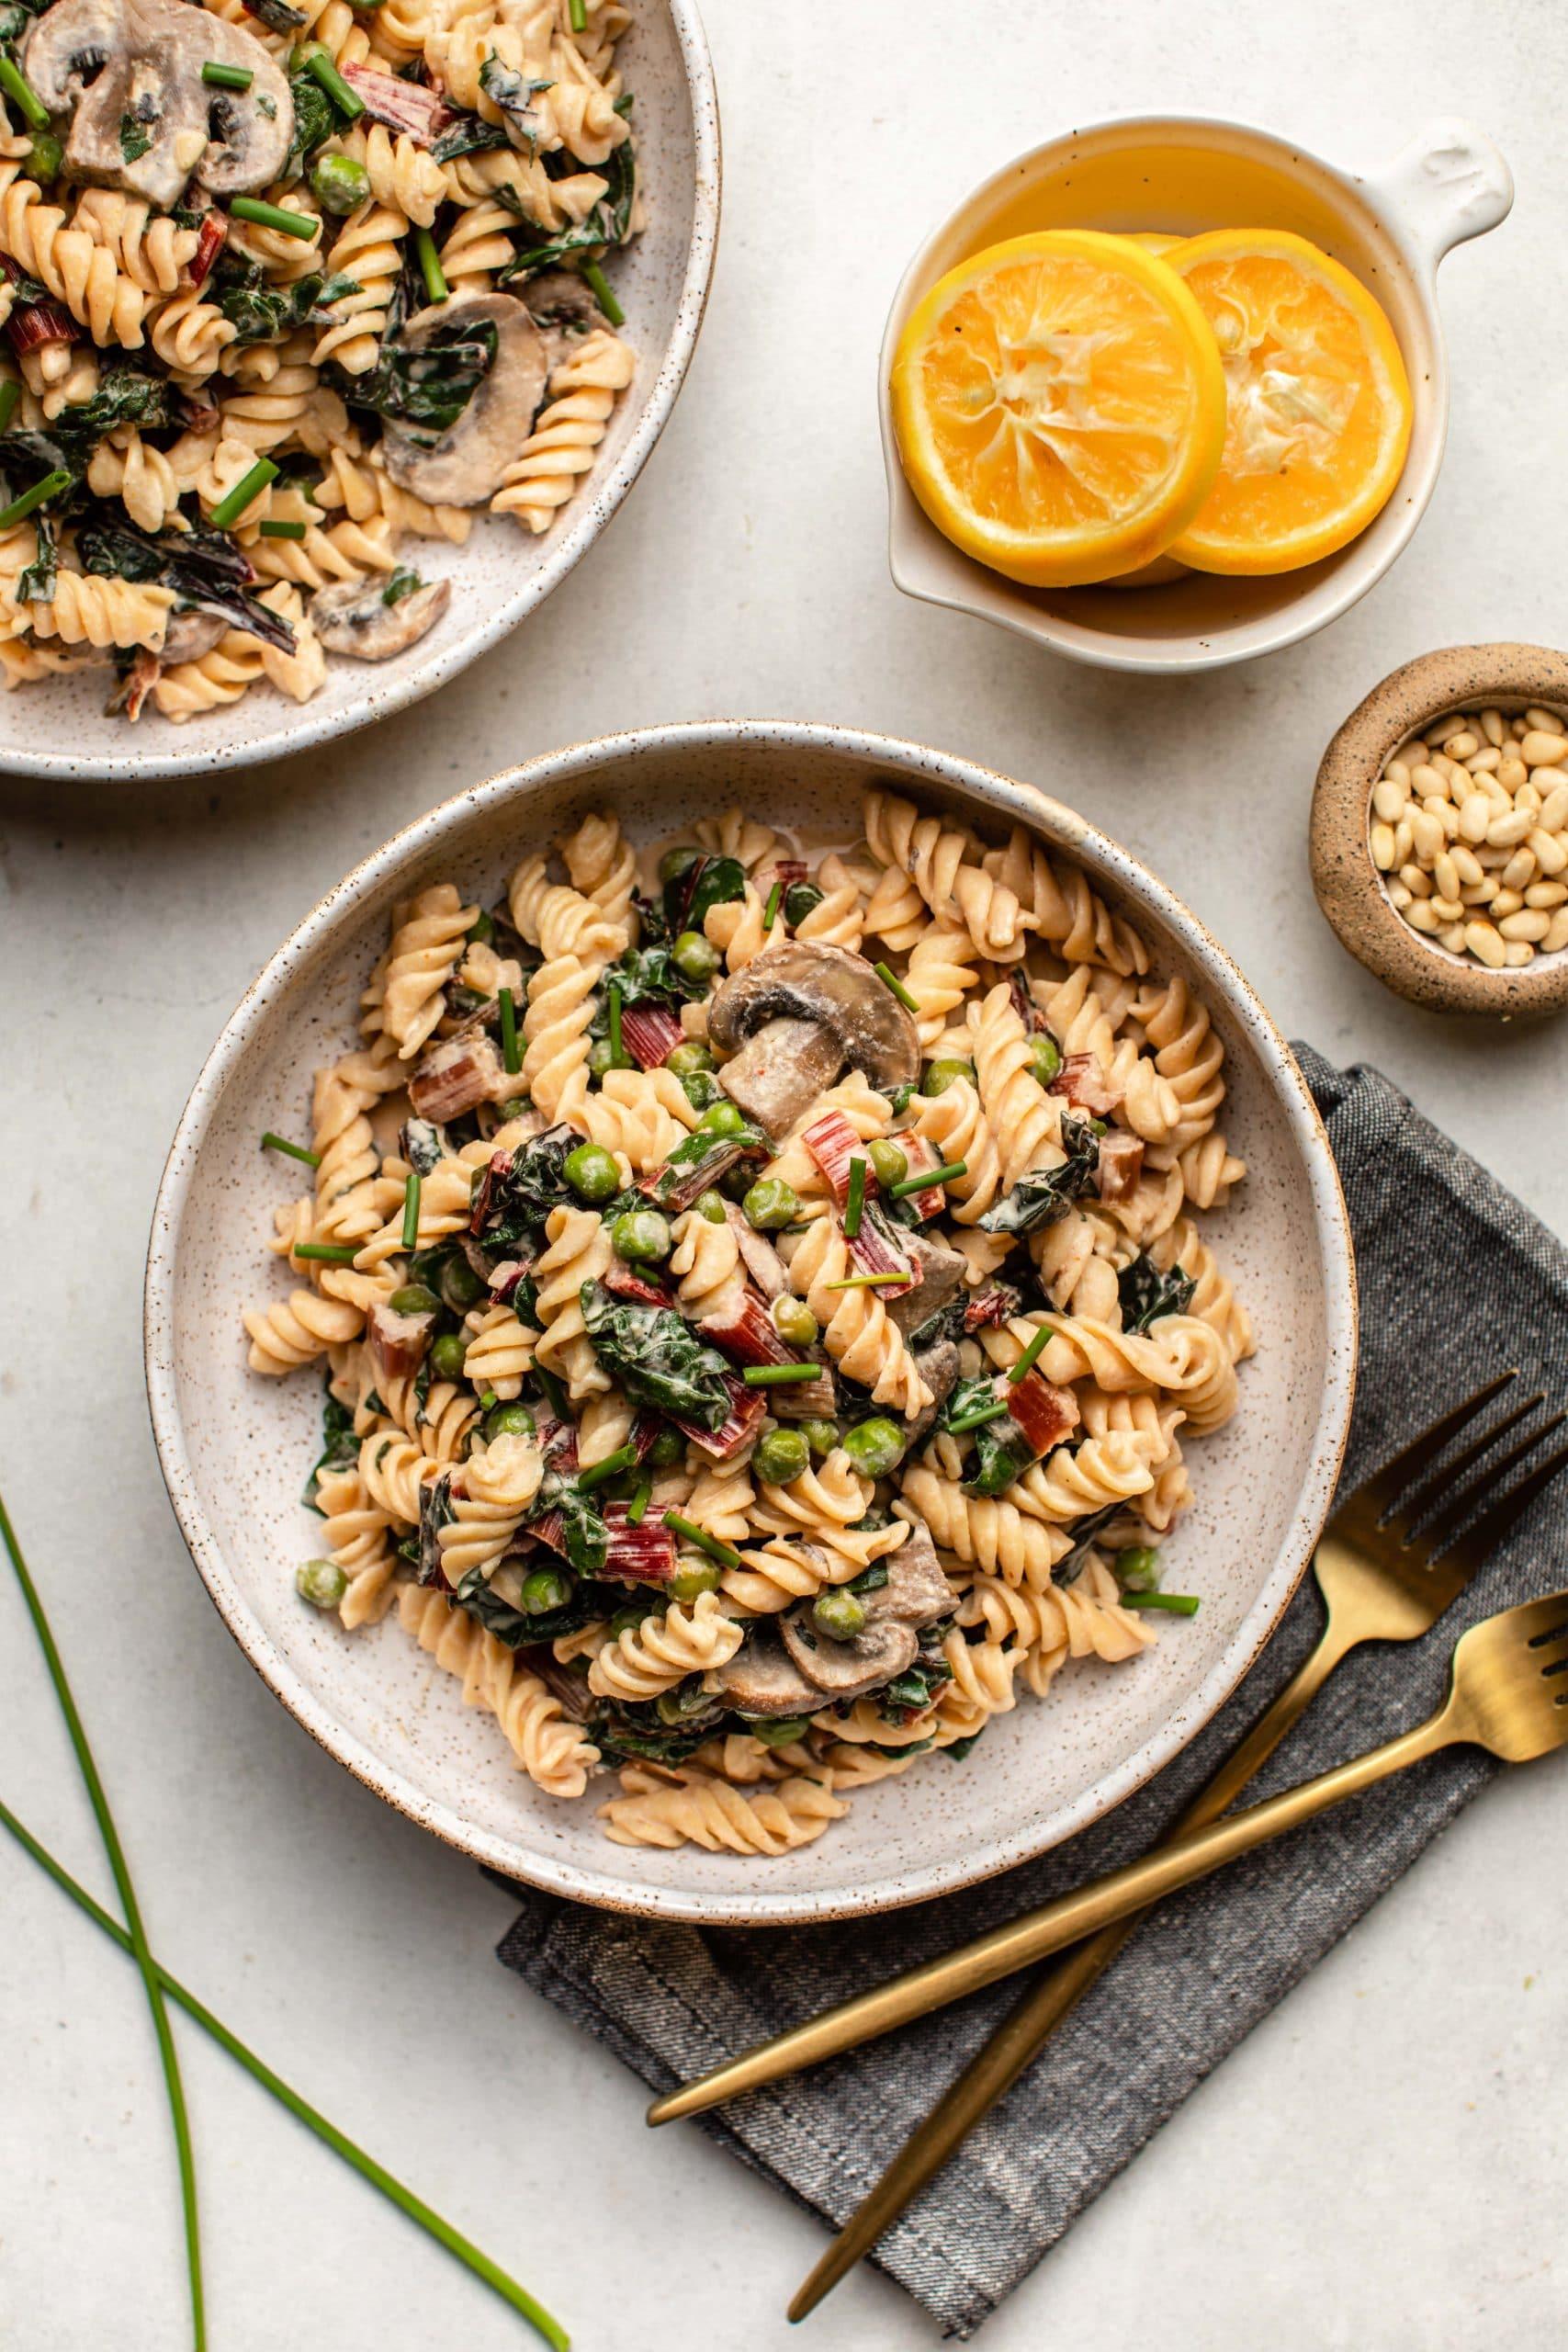 Creamy_Vegan_Lemon_Pasta_Pine_Nuts_Spring_Vegetables-5-scaled